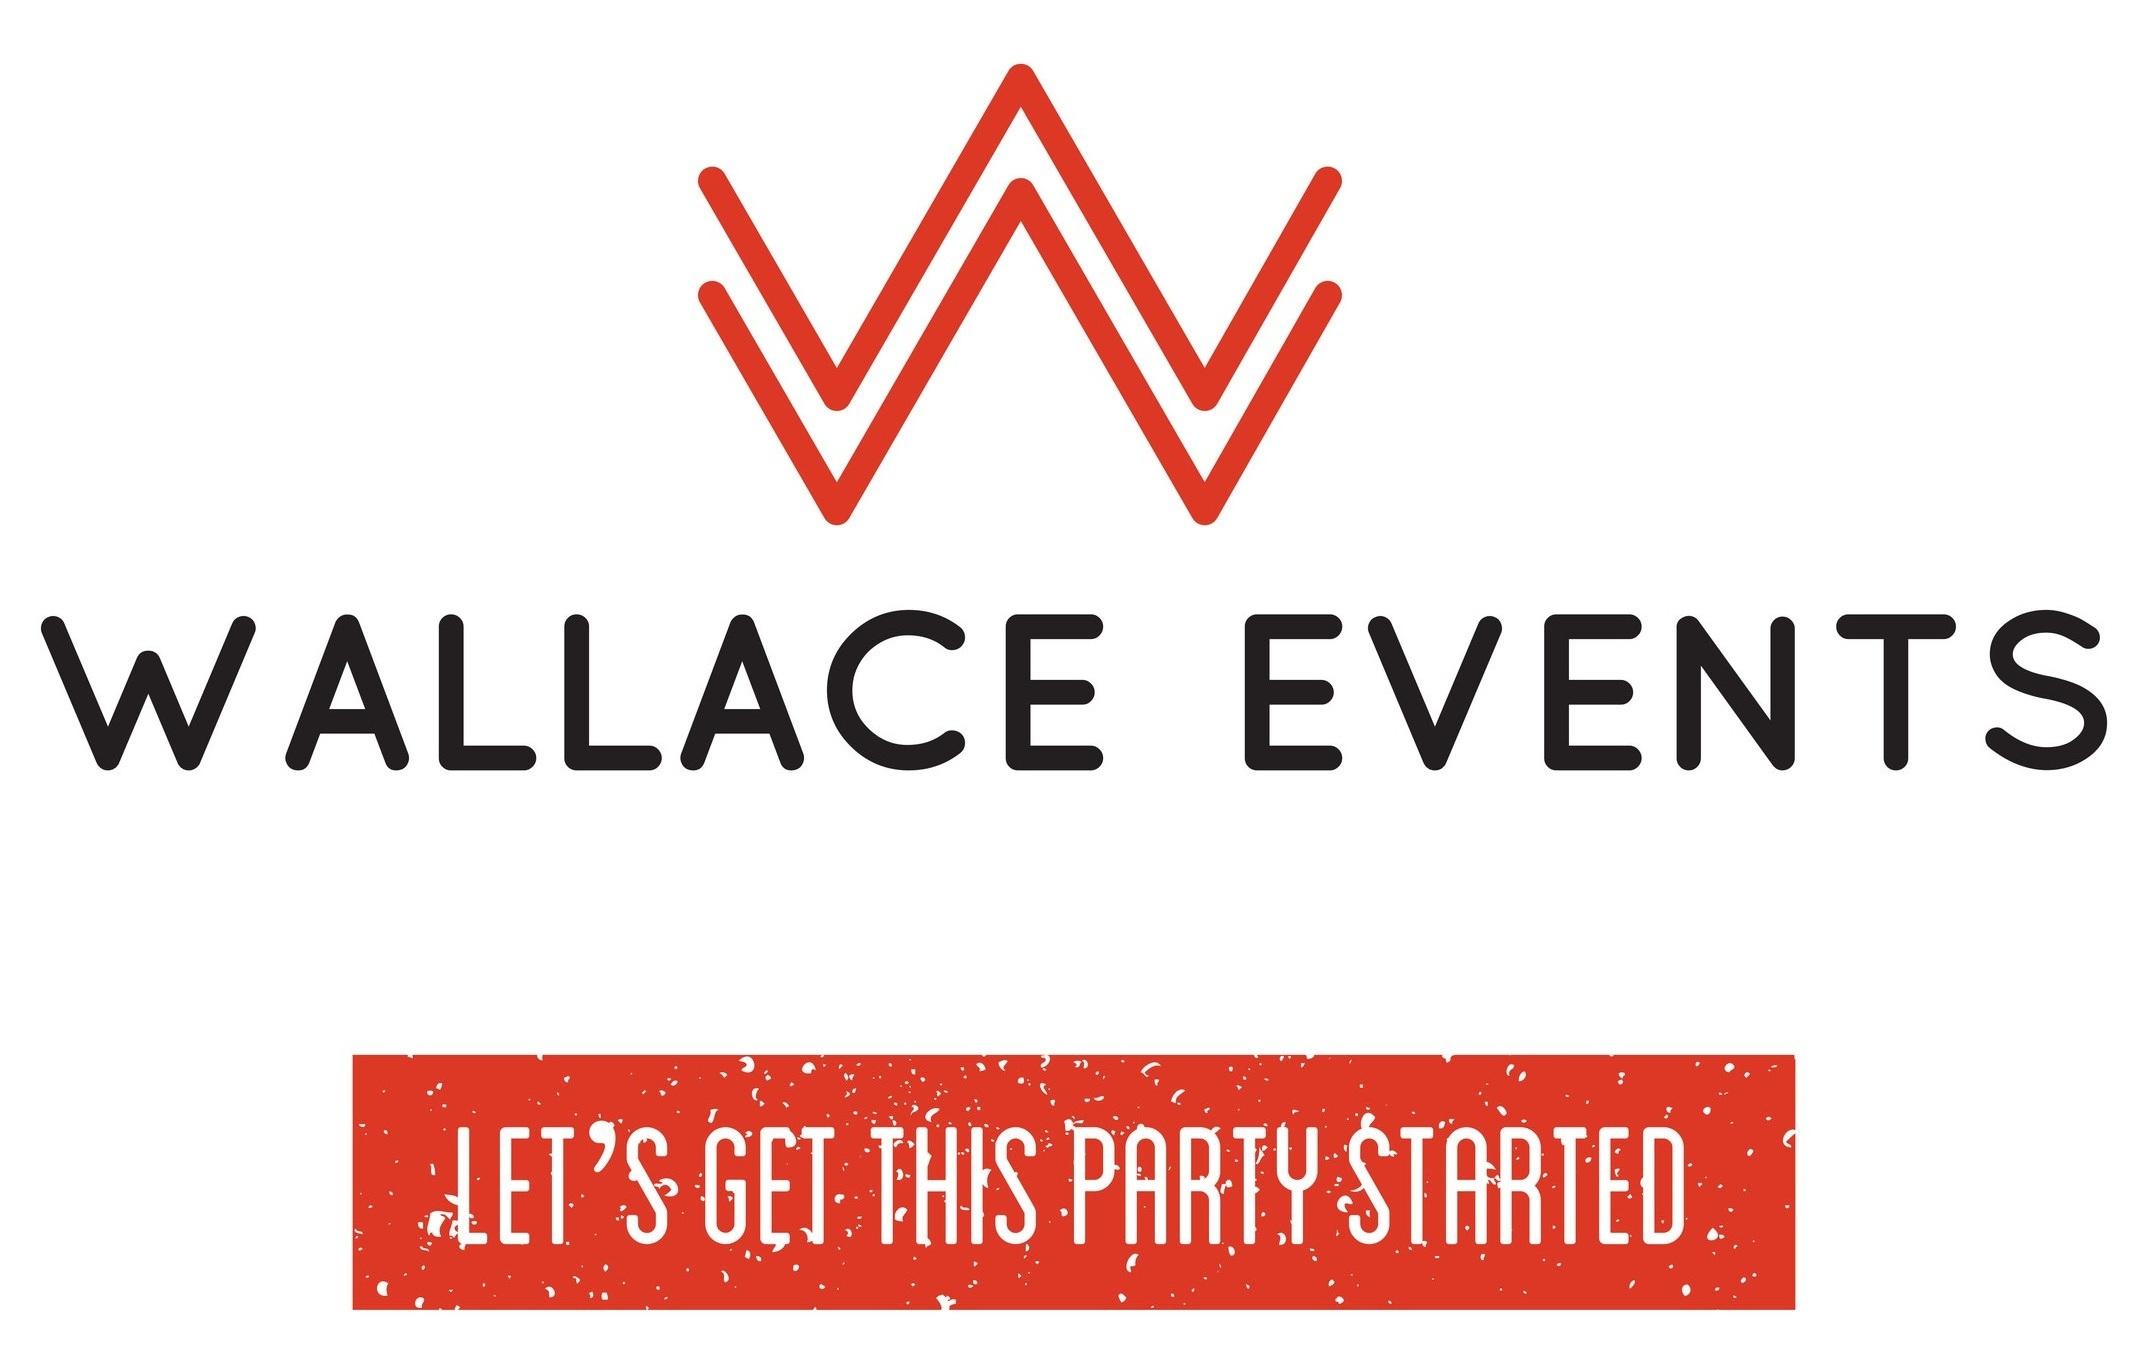 WallaceEvents_StoreSignage_RocklandRoad_MAR2015%252B2.jpg